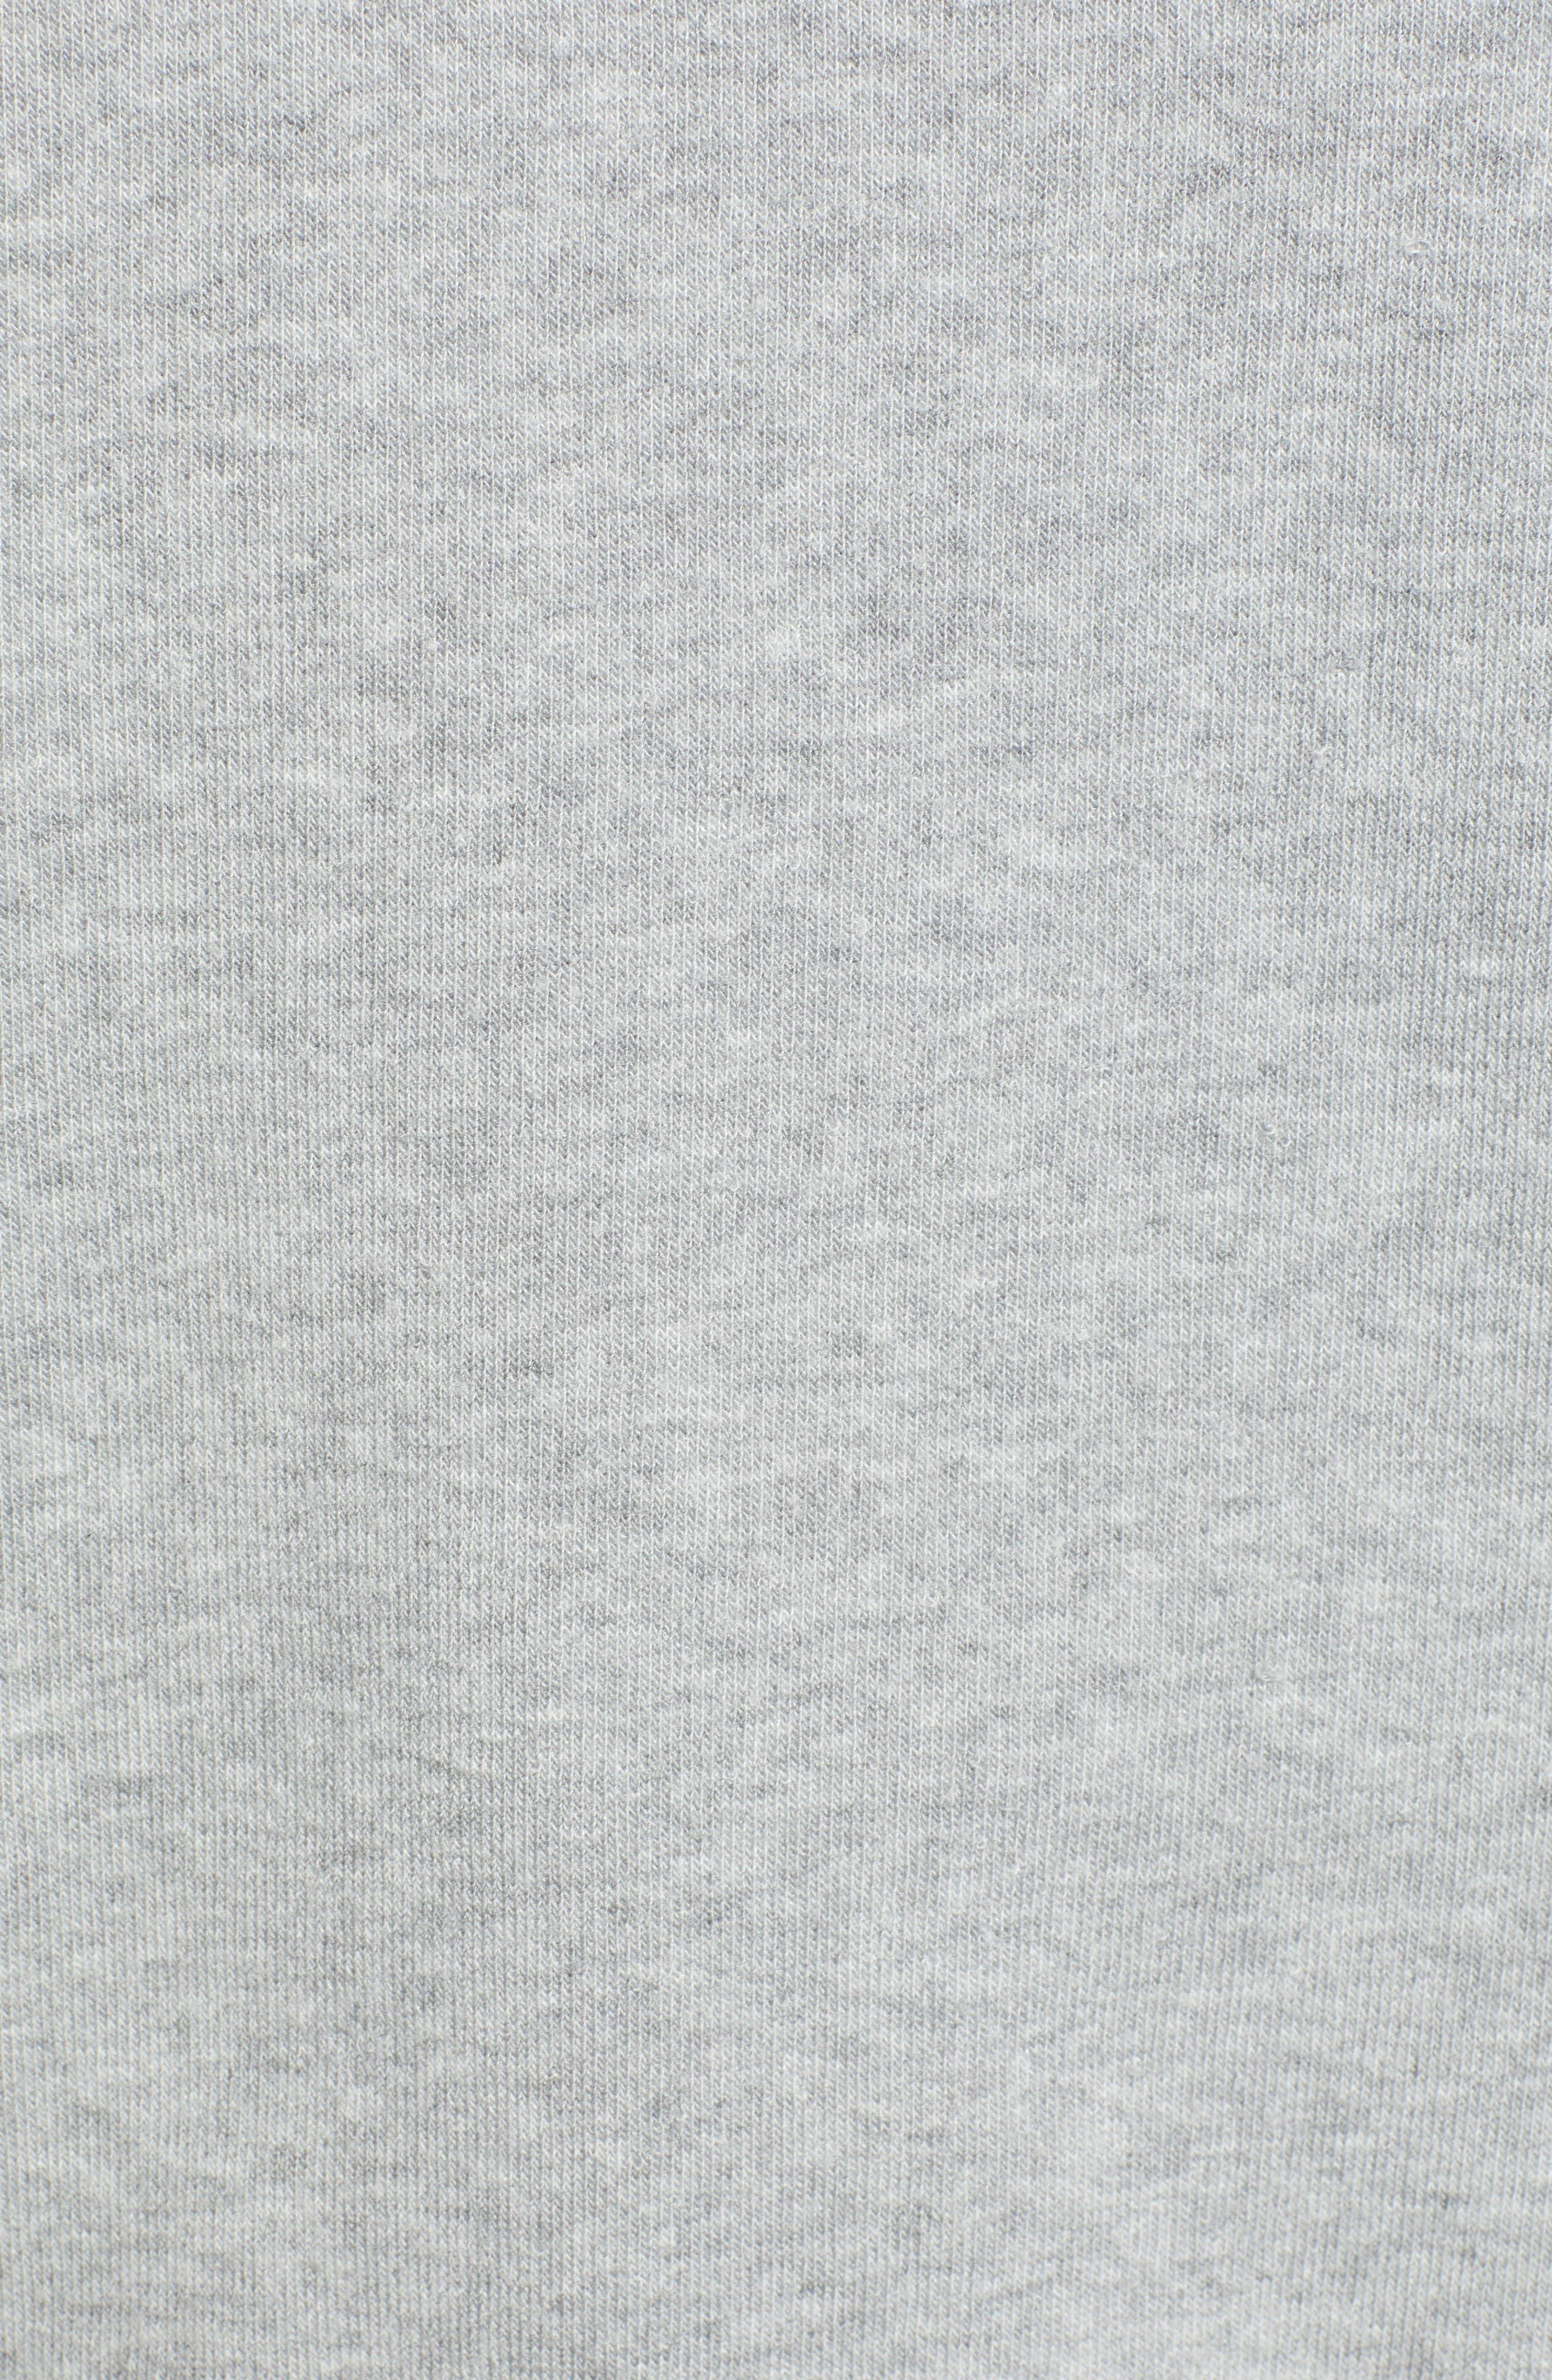 Naughty/Nice Reversible Sweatshirt,                             Alternate thumbnail 6, color,                             HEATHER GREY